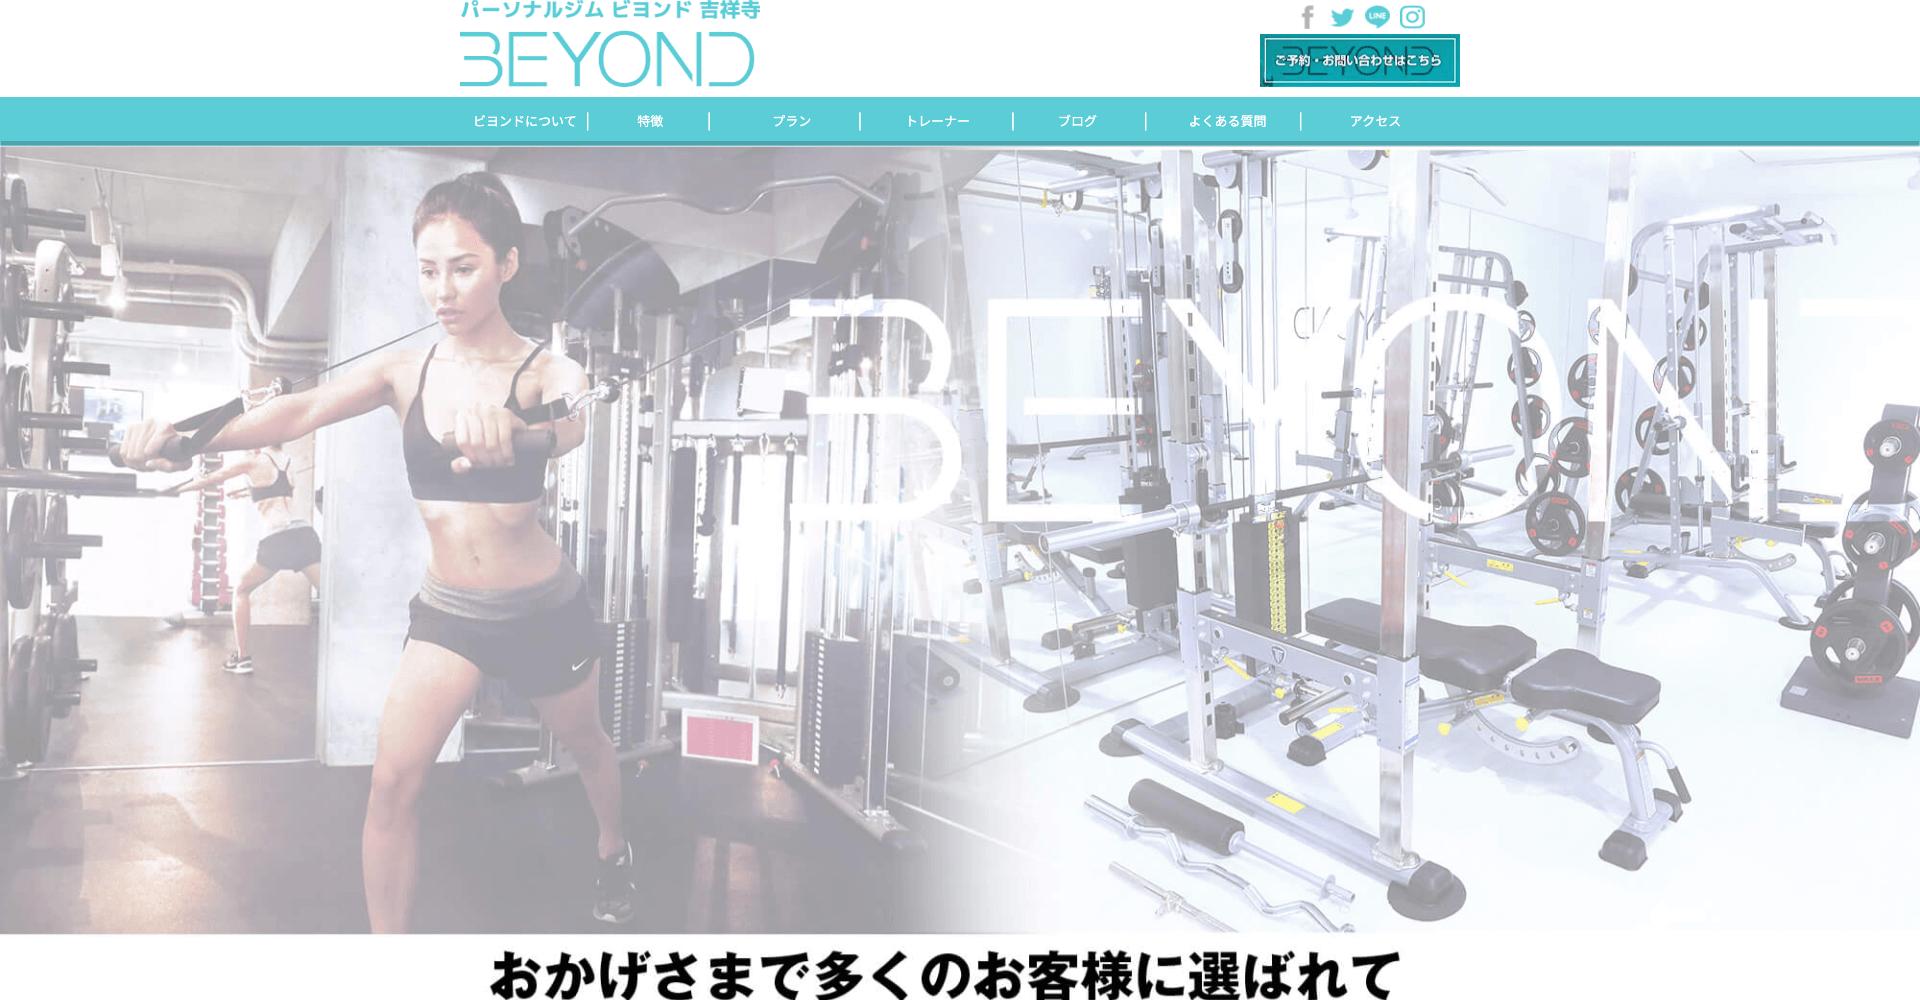 BEYOND(ビヨンド)ジム 吉祥寺店